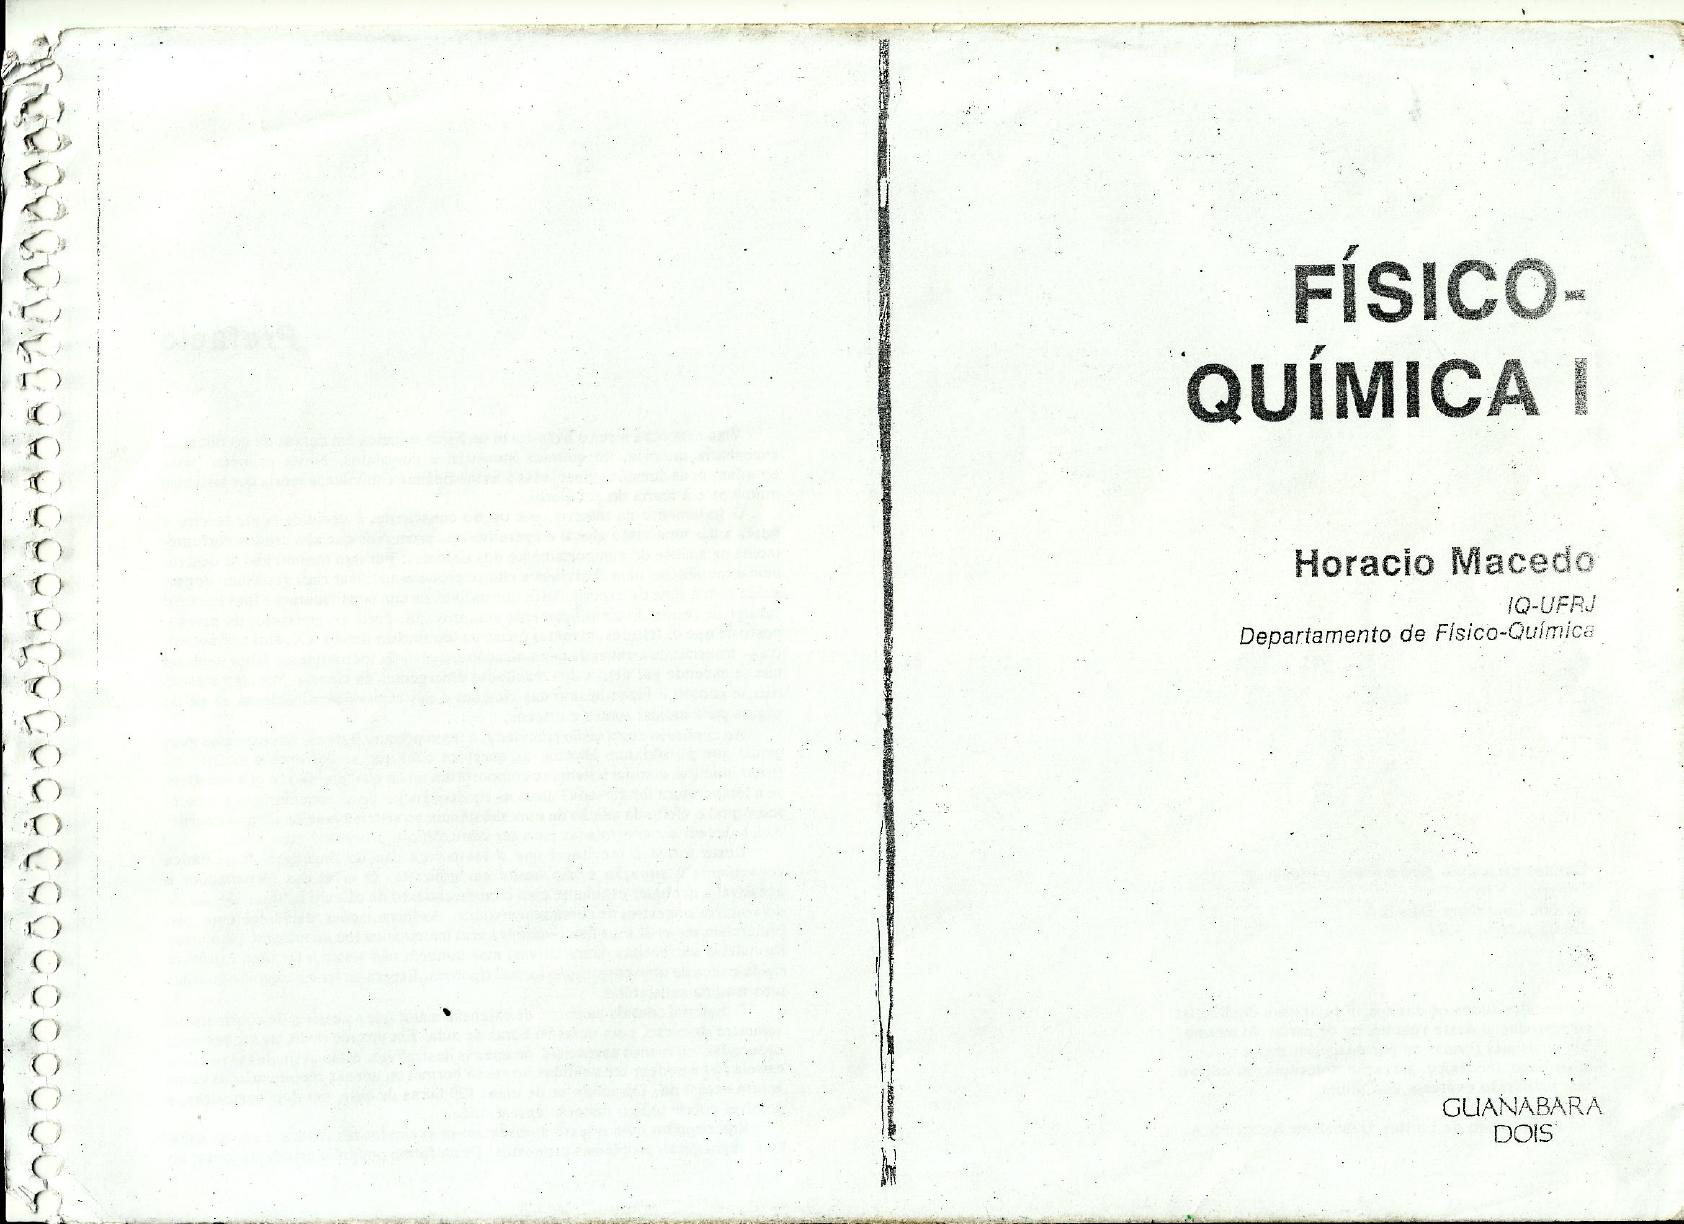 1783162193 furthermore Field image additionally Detail also Antonio Meucci Teletrofono in addition Iaim Logo. on 269